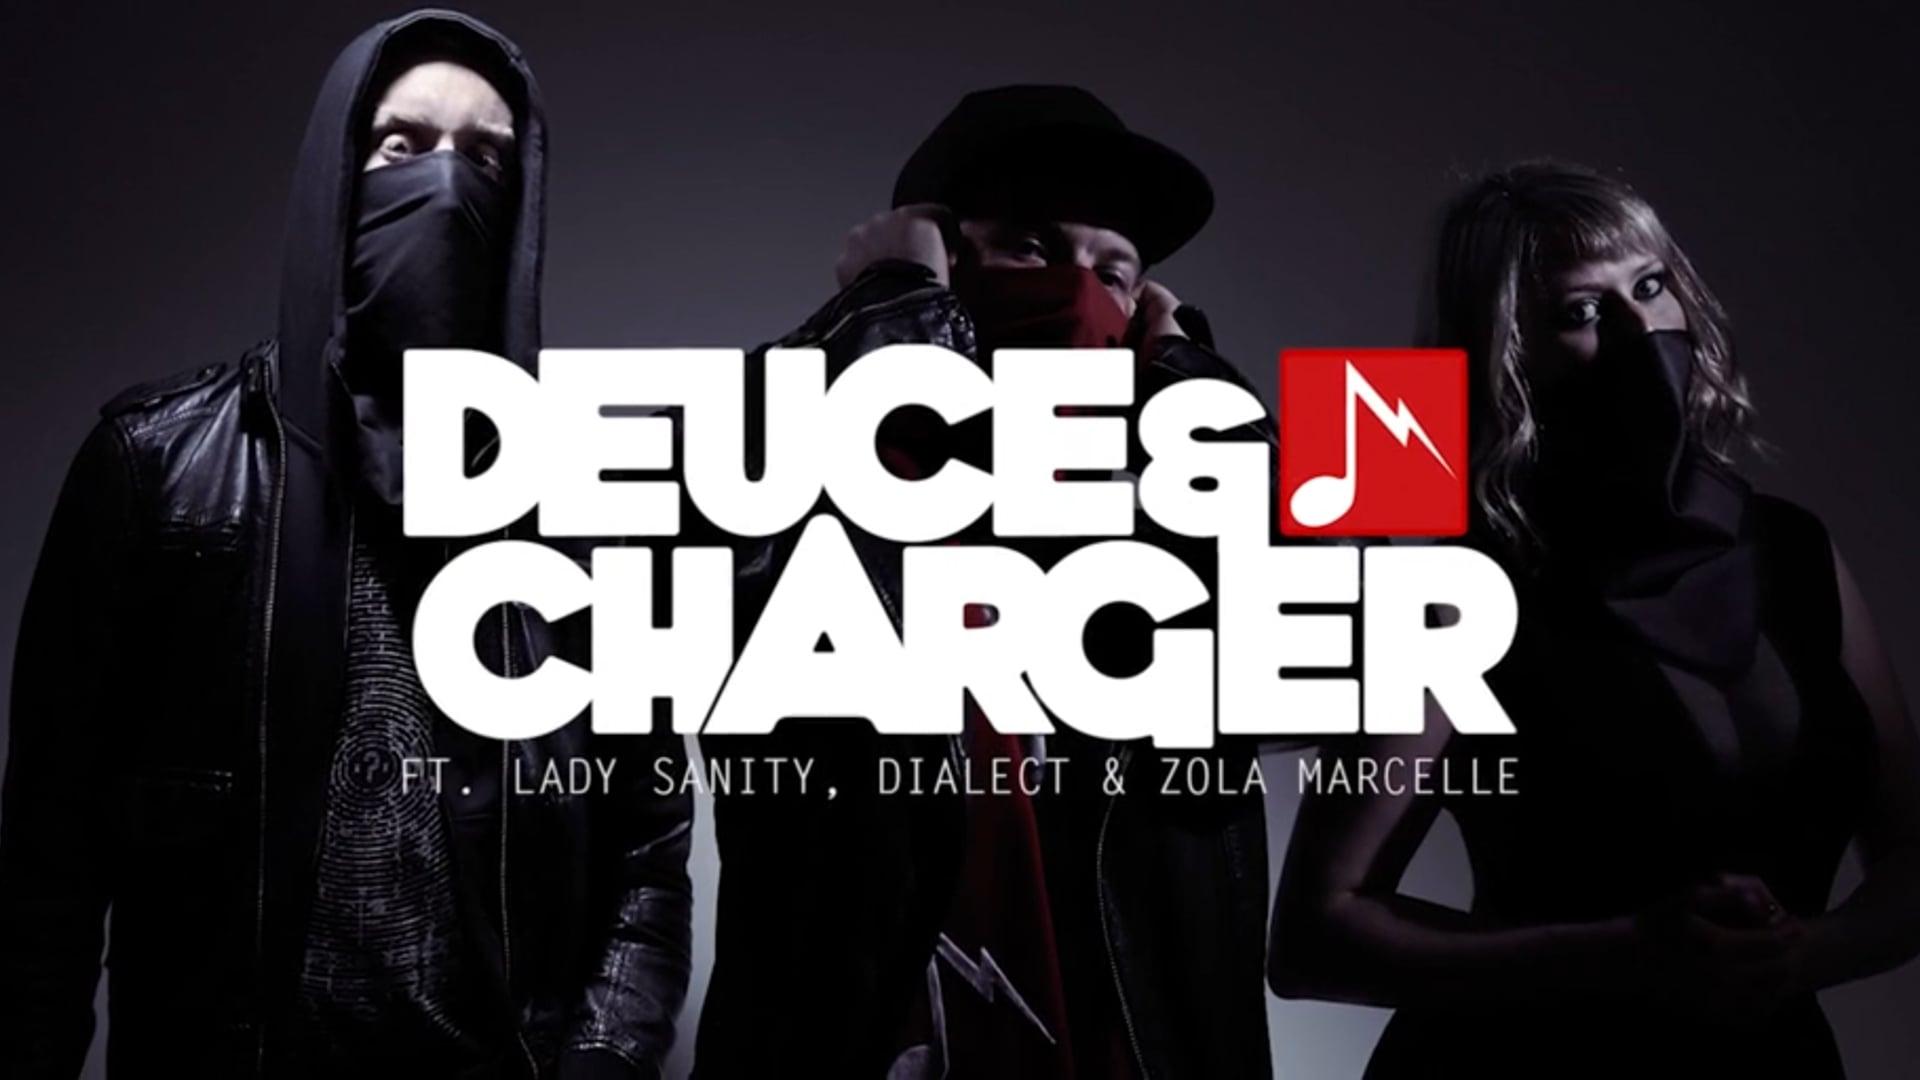 DEUCE & CHARGER - TEAR DOWN THE BARRICADES